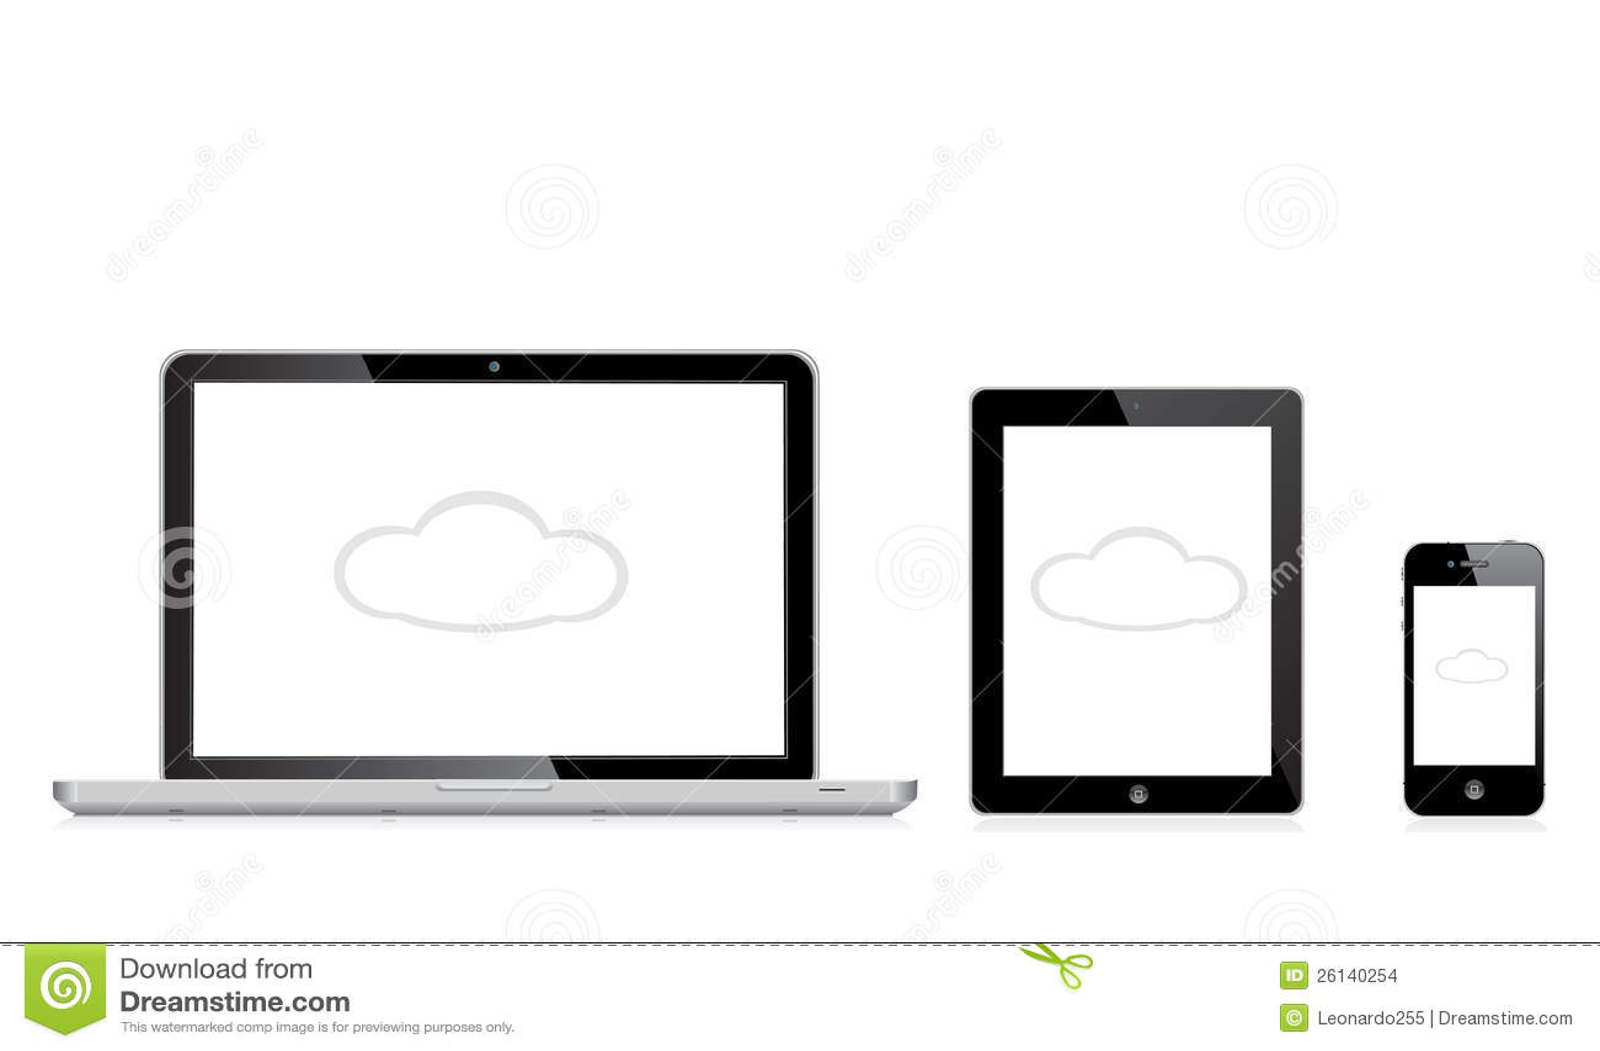 Apple Mac Ipad Iphone Editorial Stock Image